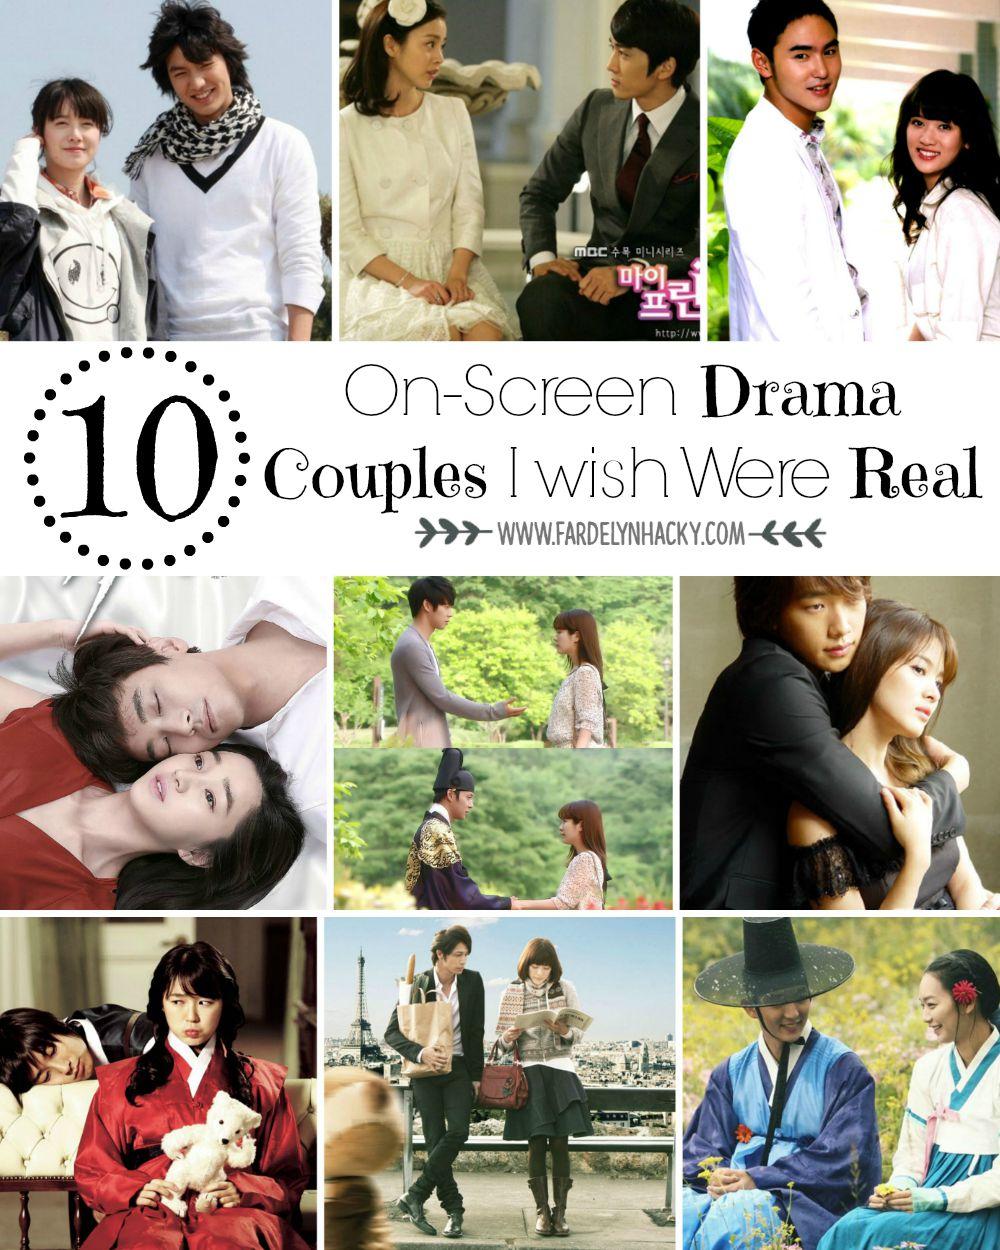 Pasangan Drama Asia Terbaik, Pasangan Drama Korea Terbaik